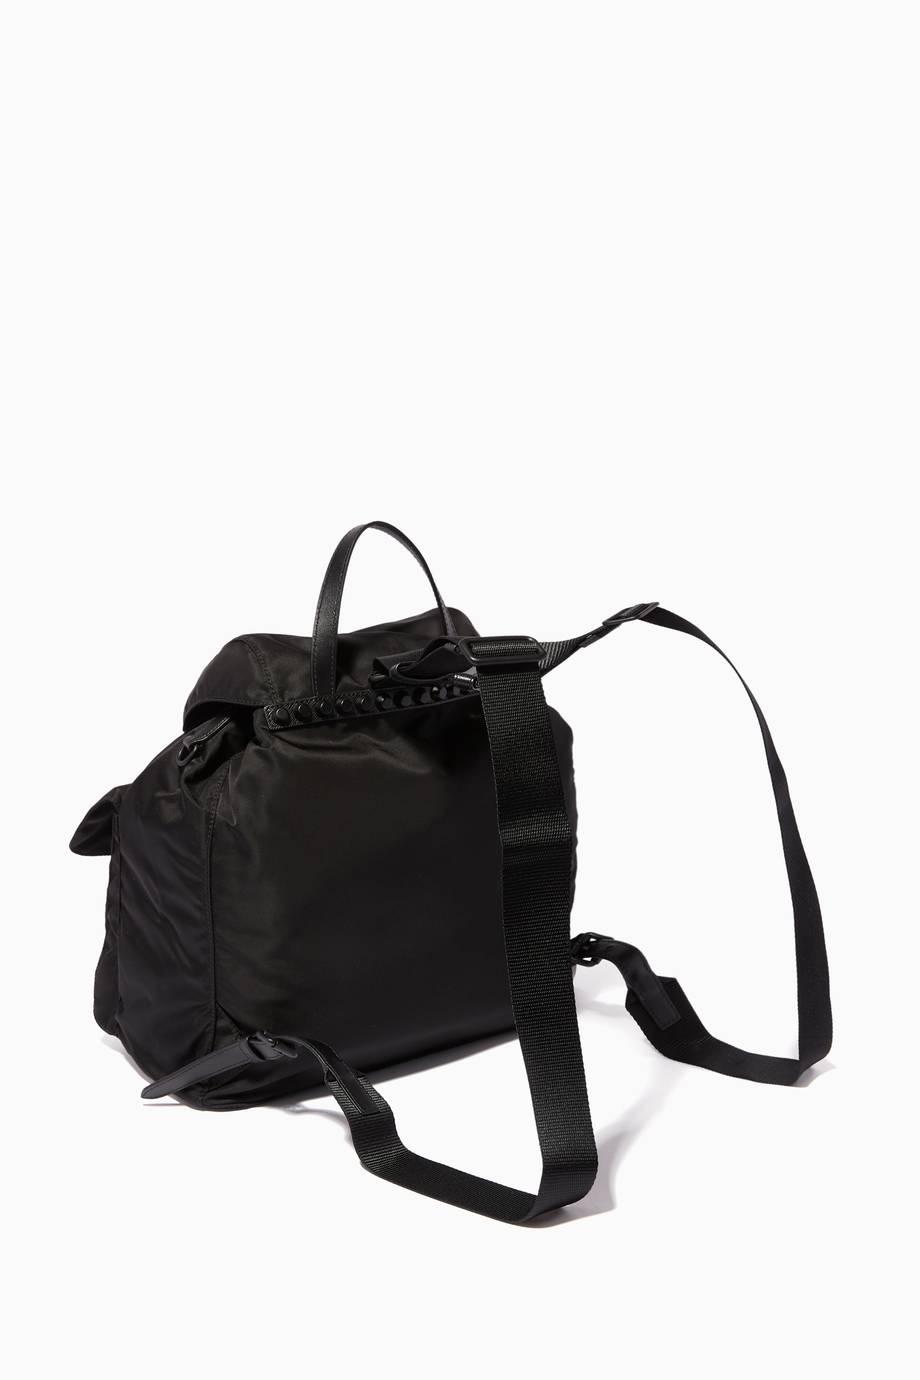 Prada Mini Nylon Backpack- Fenix Toulouse Handball 5f36582d2b56d